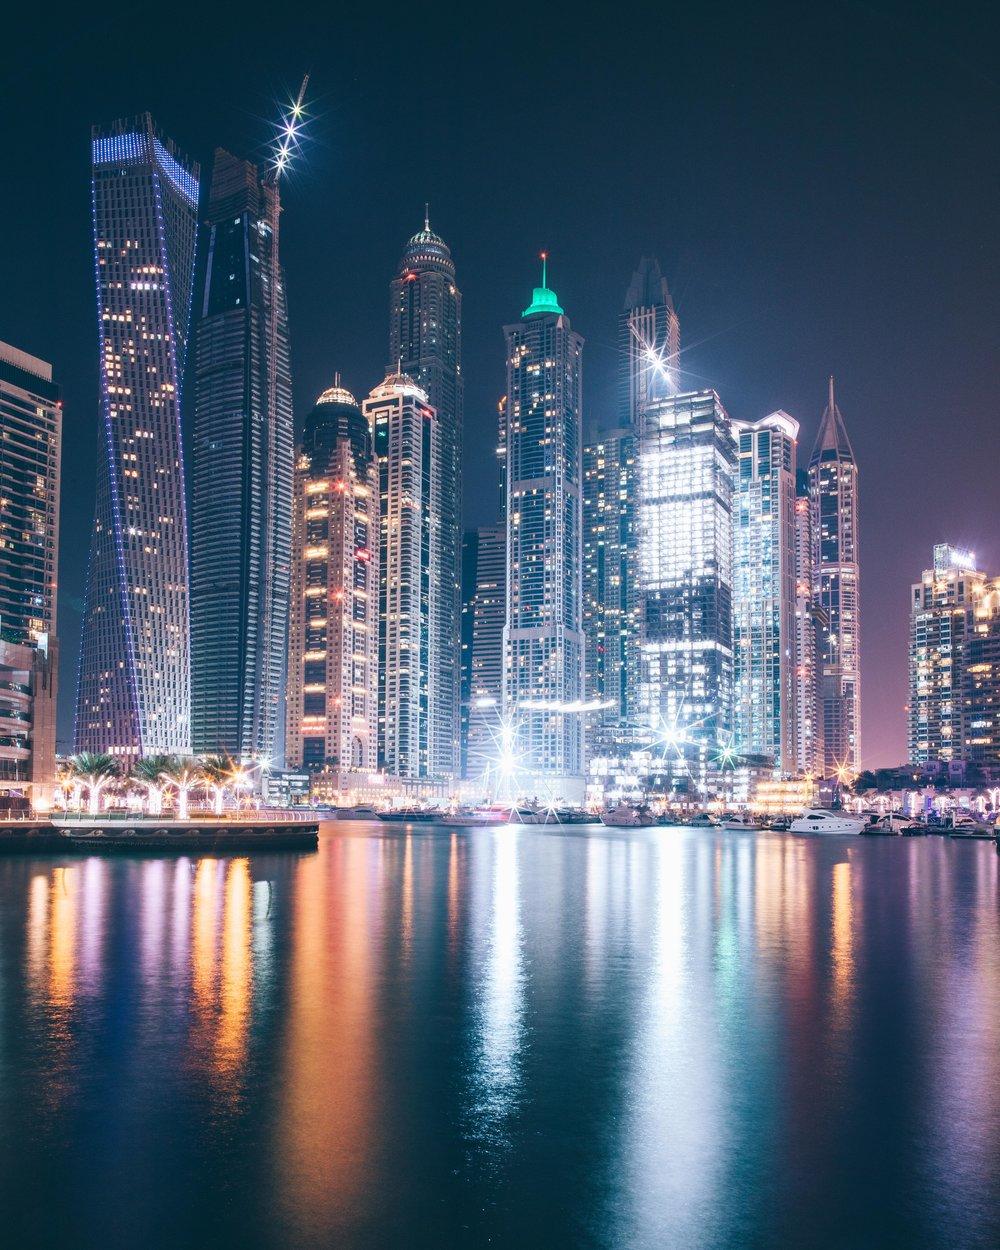 Dubai_Marina-1.jpg